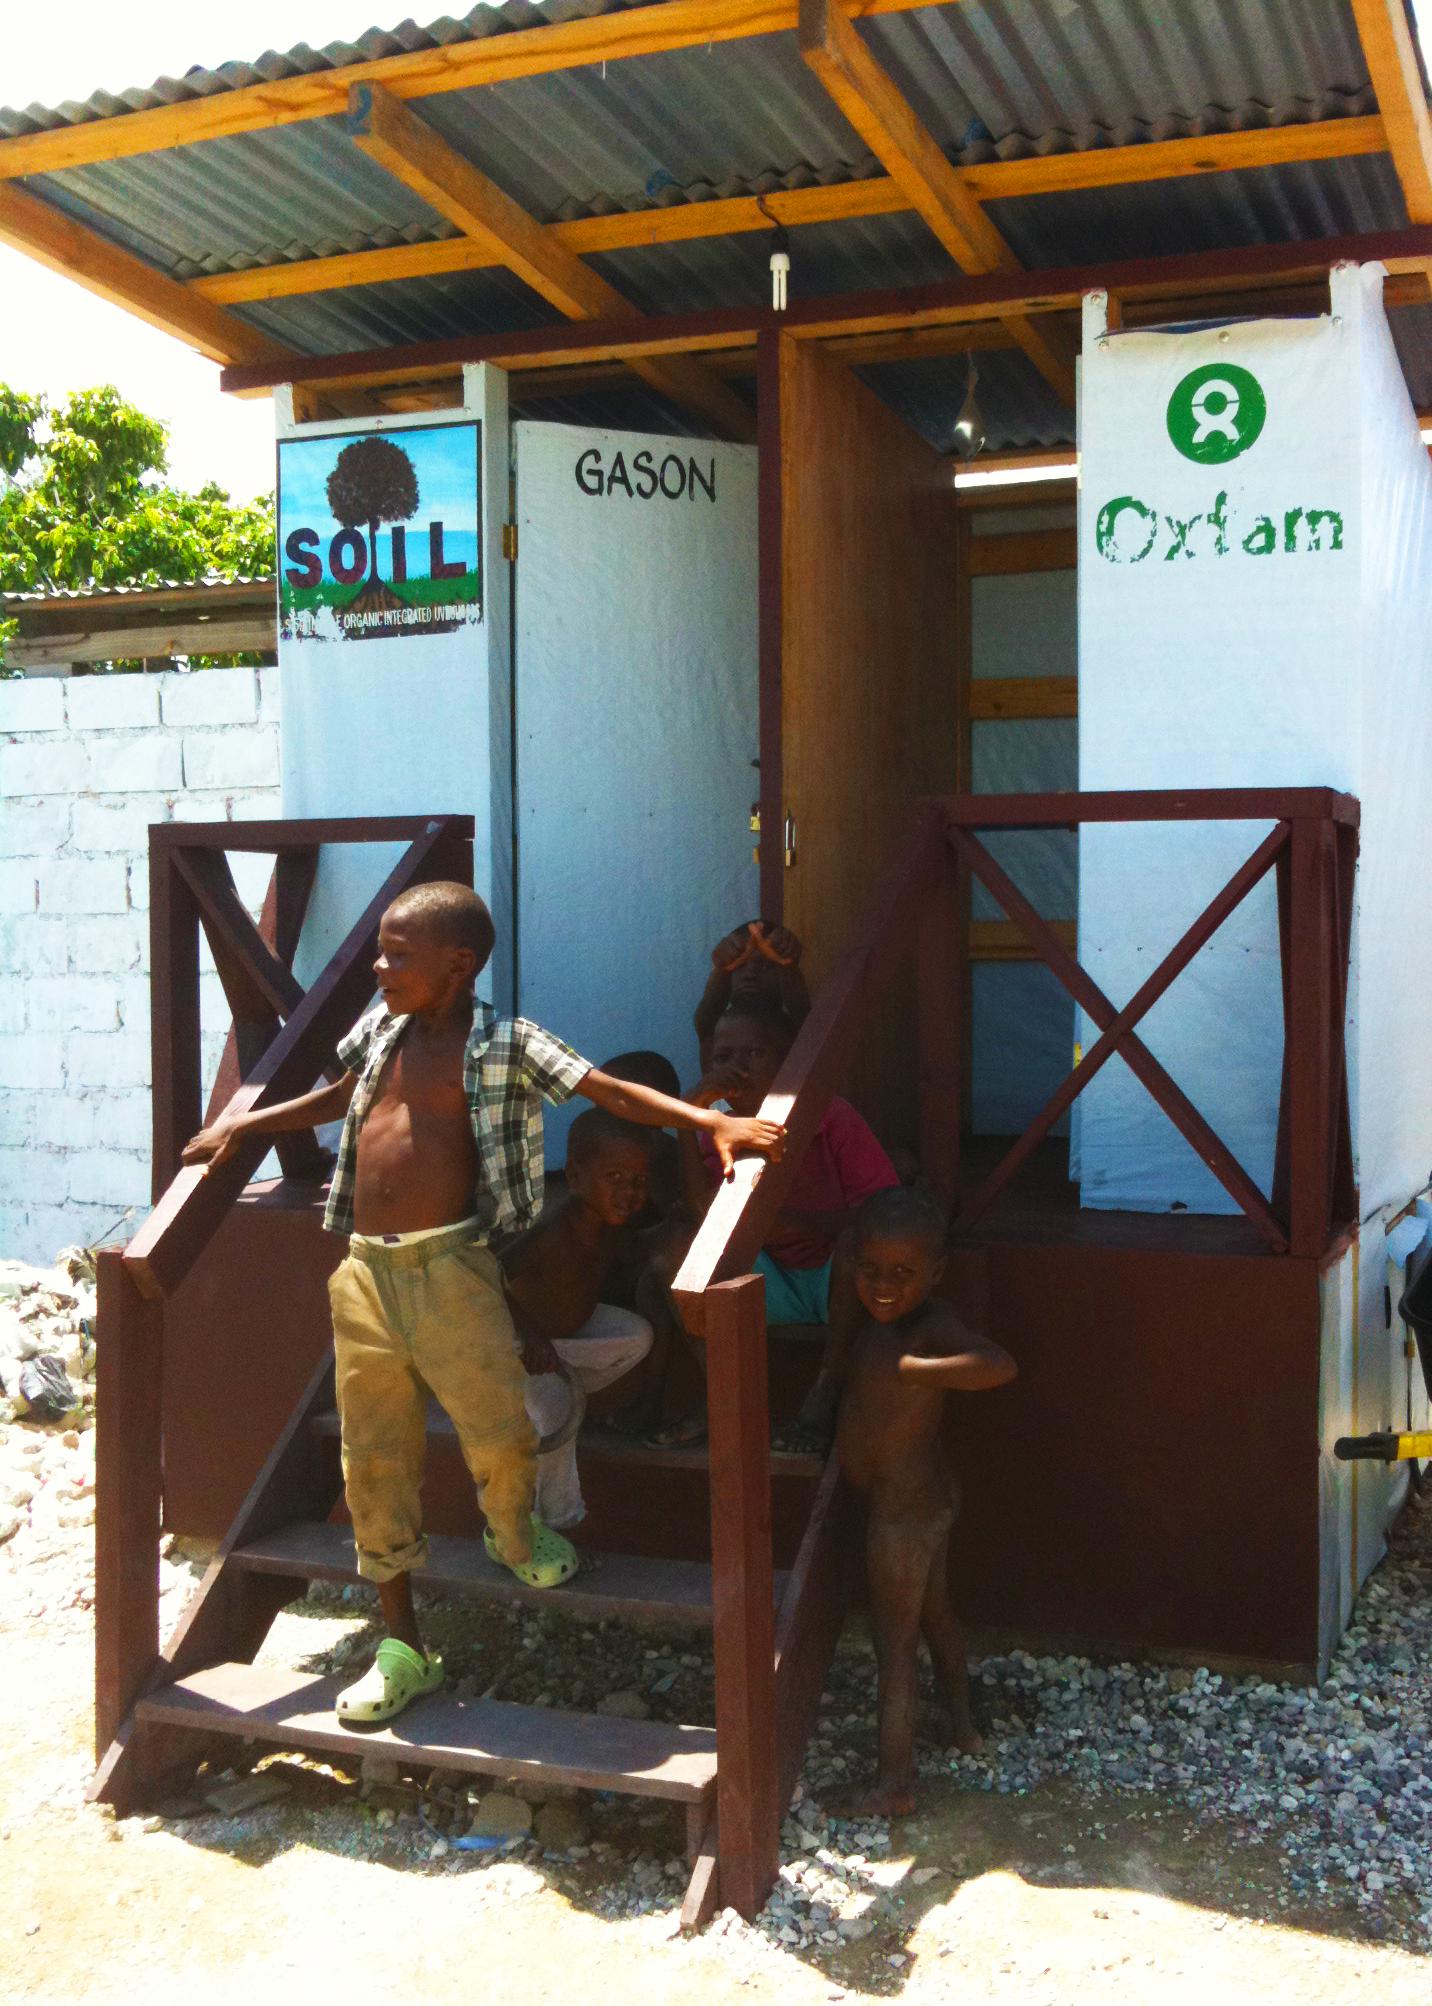 SOIL-run latrine in the Cite Soleil neighborhood of Port-au-Prince